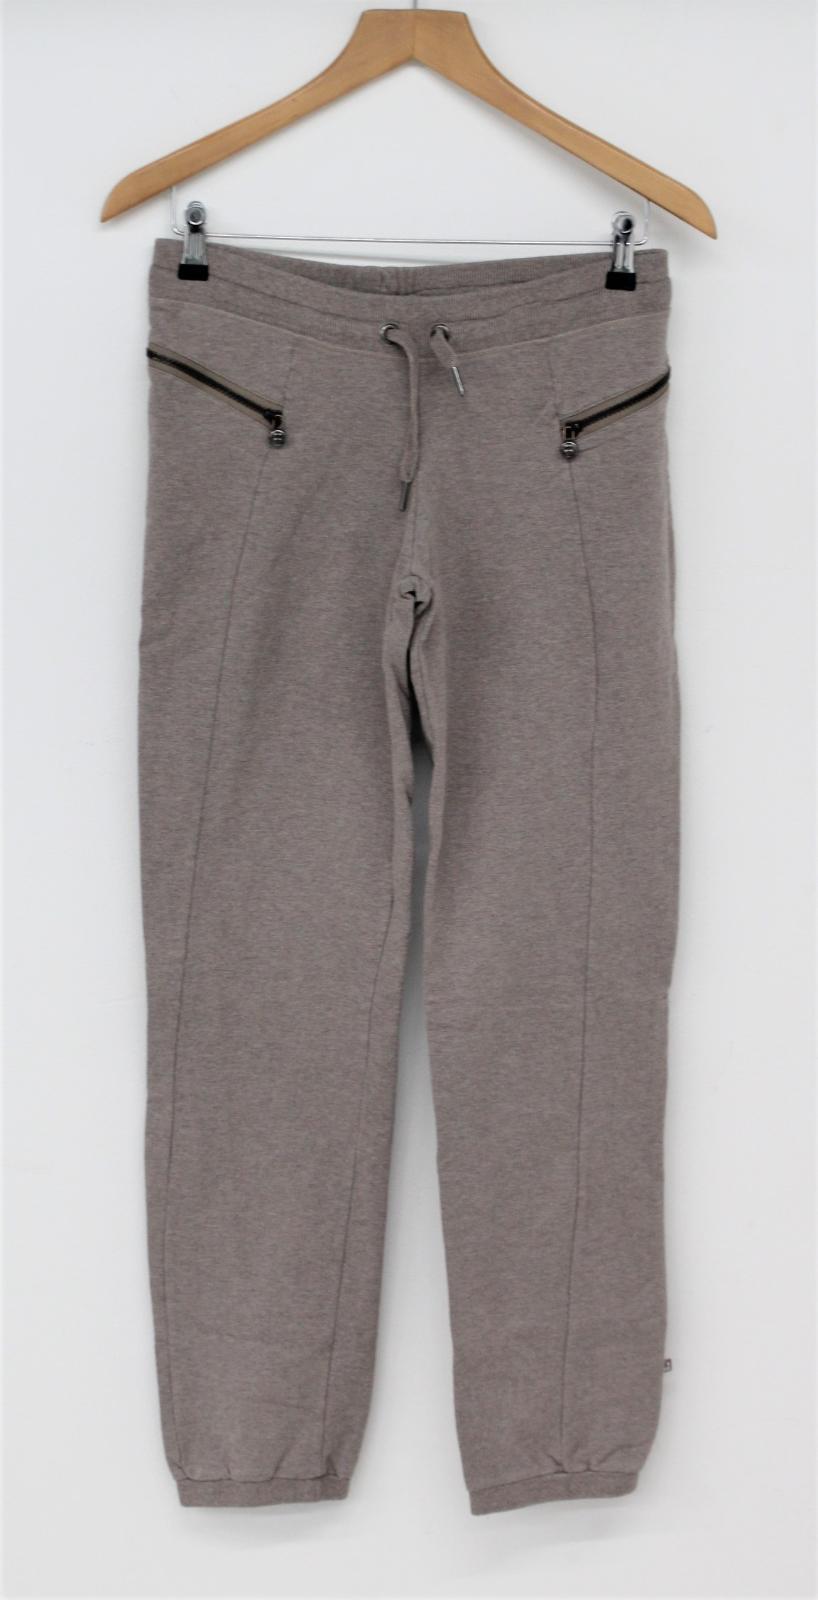 Sweaty-Betty-Damas-Malva-Mezcla-de-Algodon-Cintura-Elastica-Correr-Pantalones-S-W30 miniatura 12